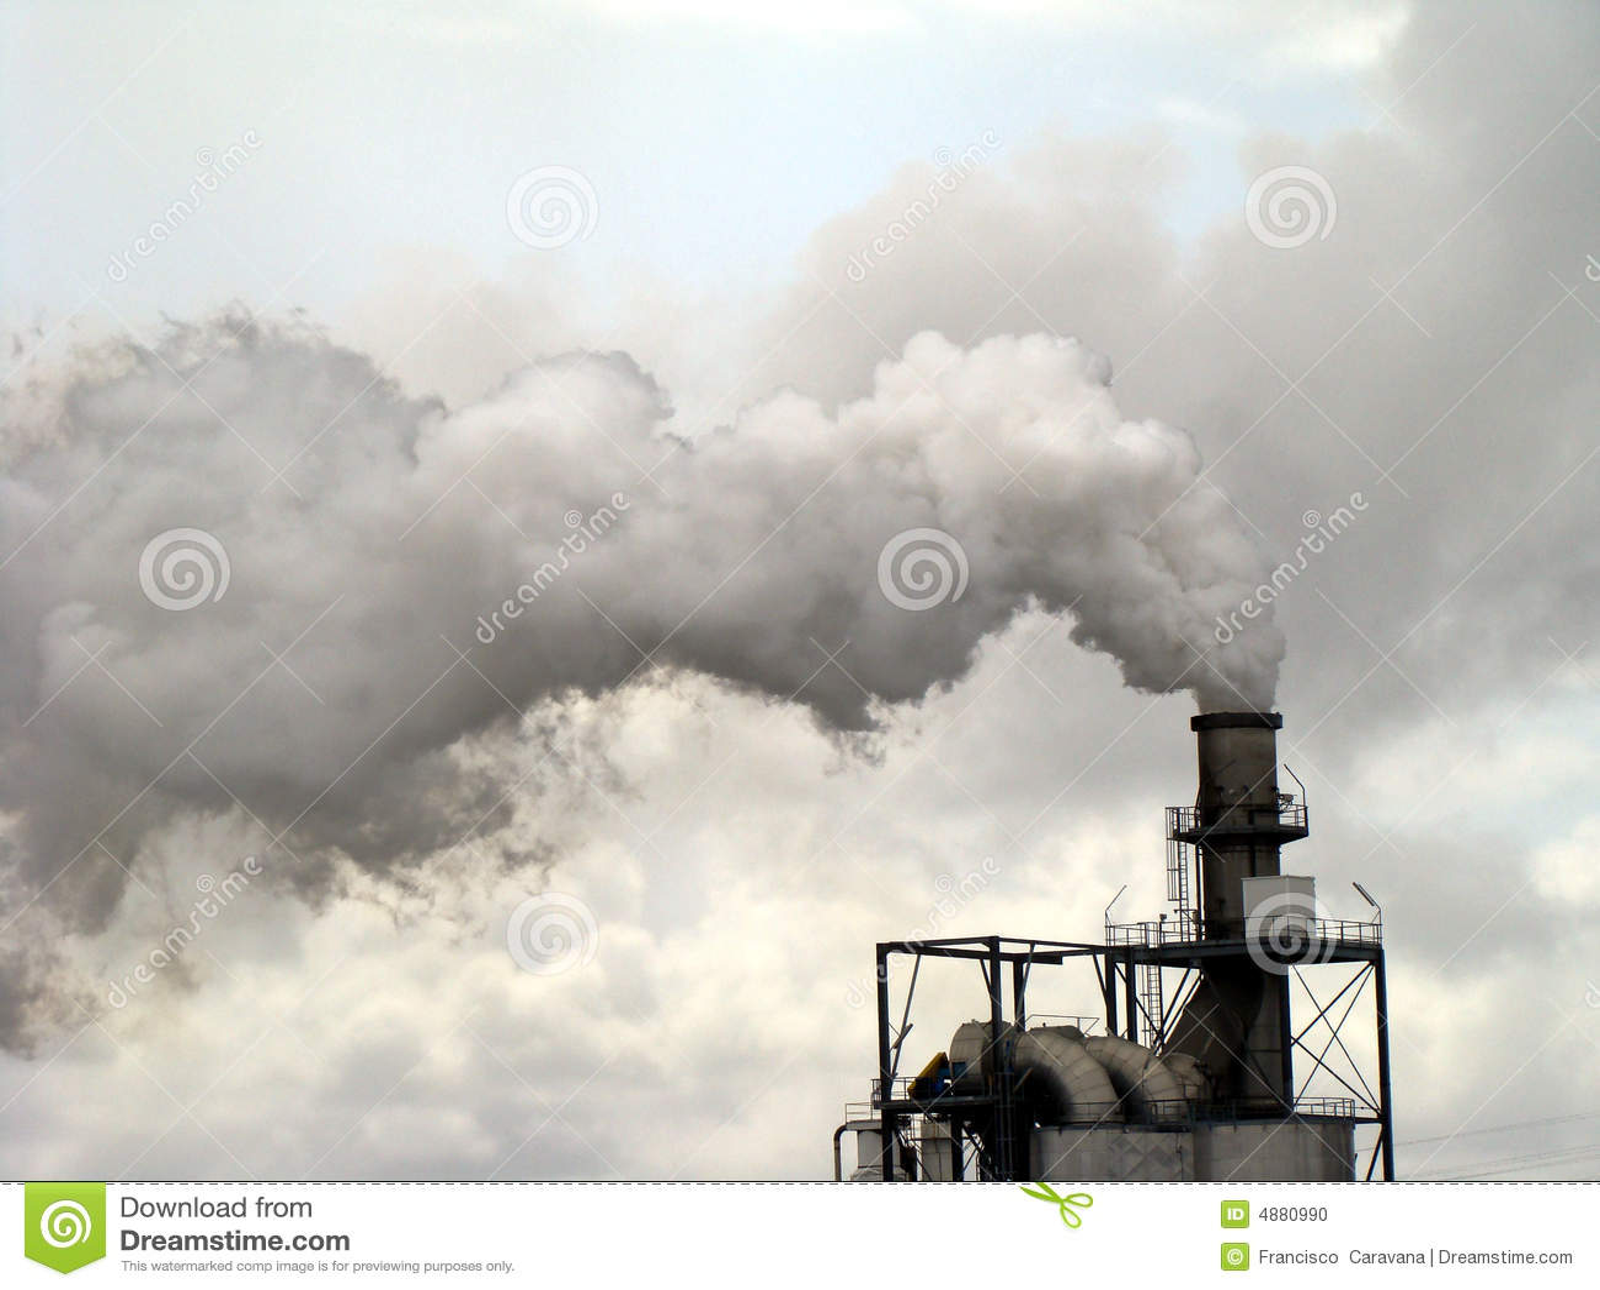 Smoke Chimney Pollution Stock Photo Image 4880990